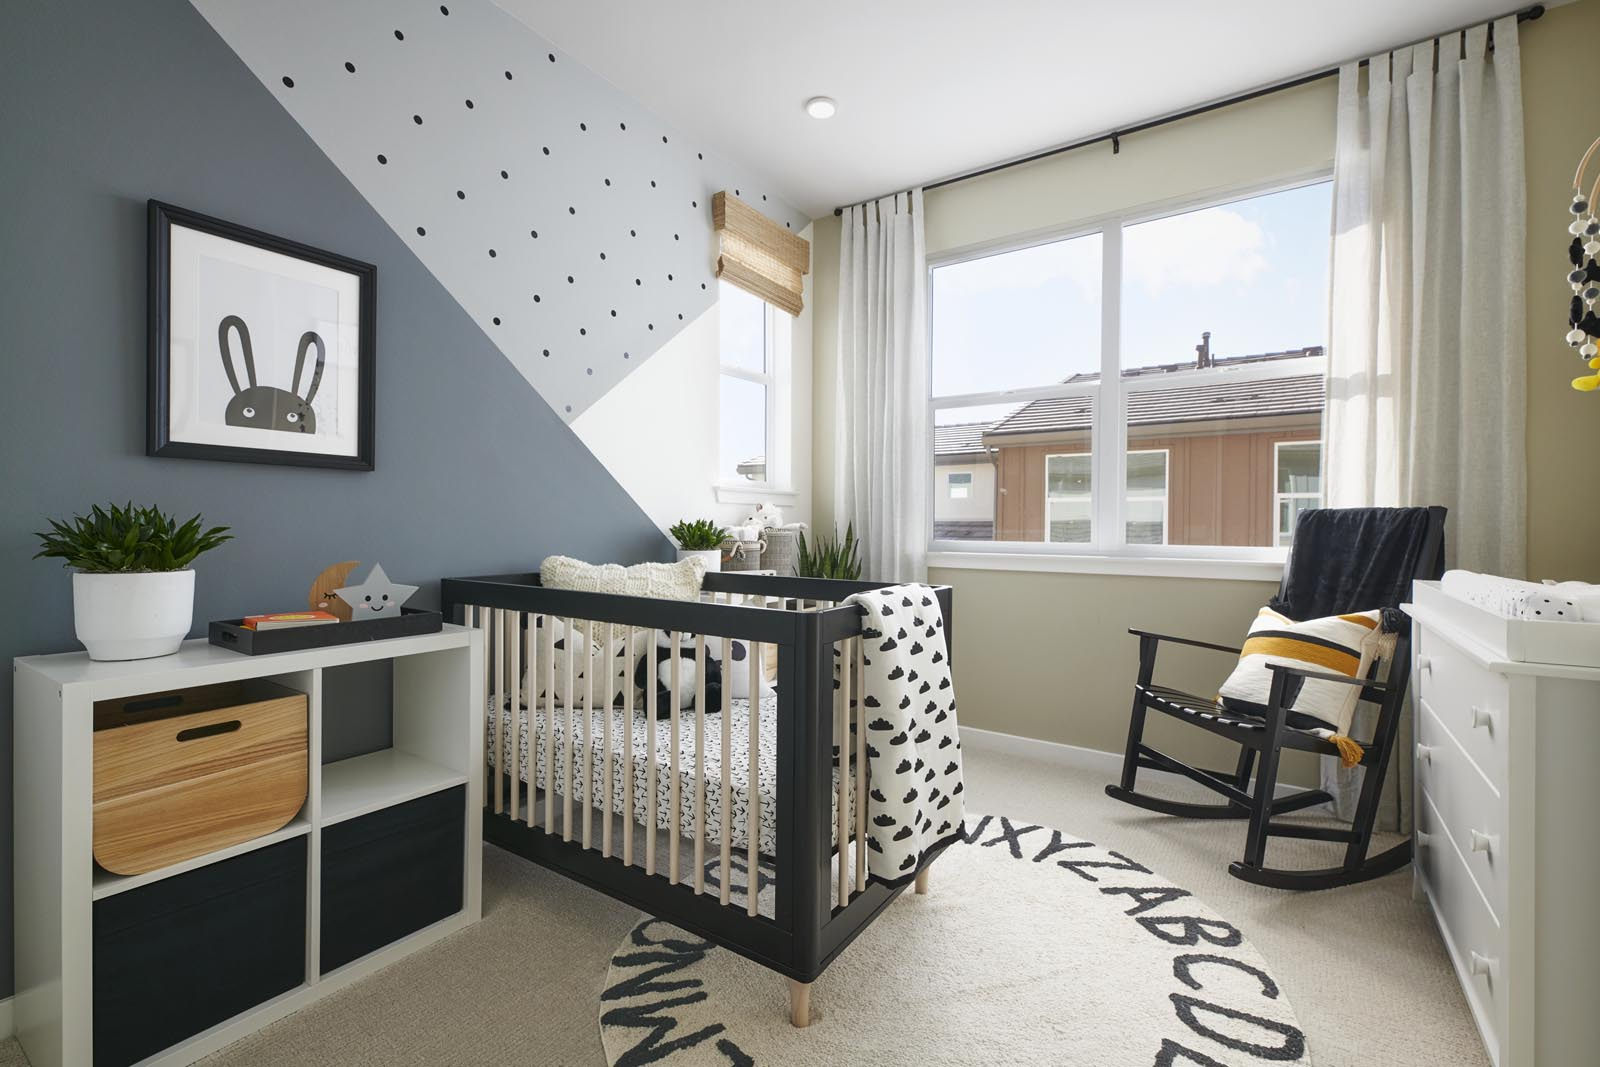 Bedroom   Residence 2   Enliven   New Homes in Rancho Cucamonga, CA   Van Daele Homes